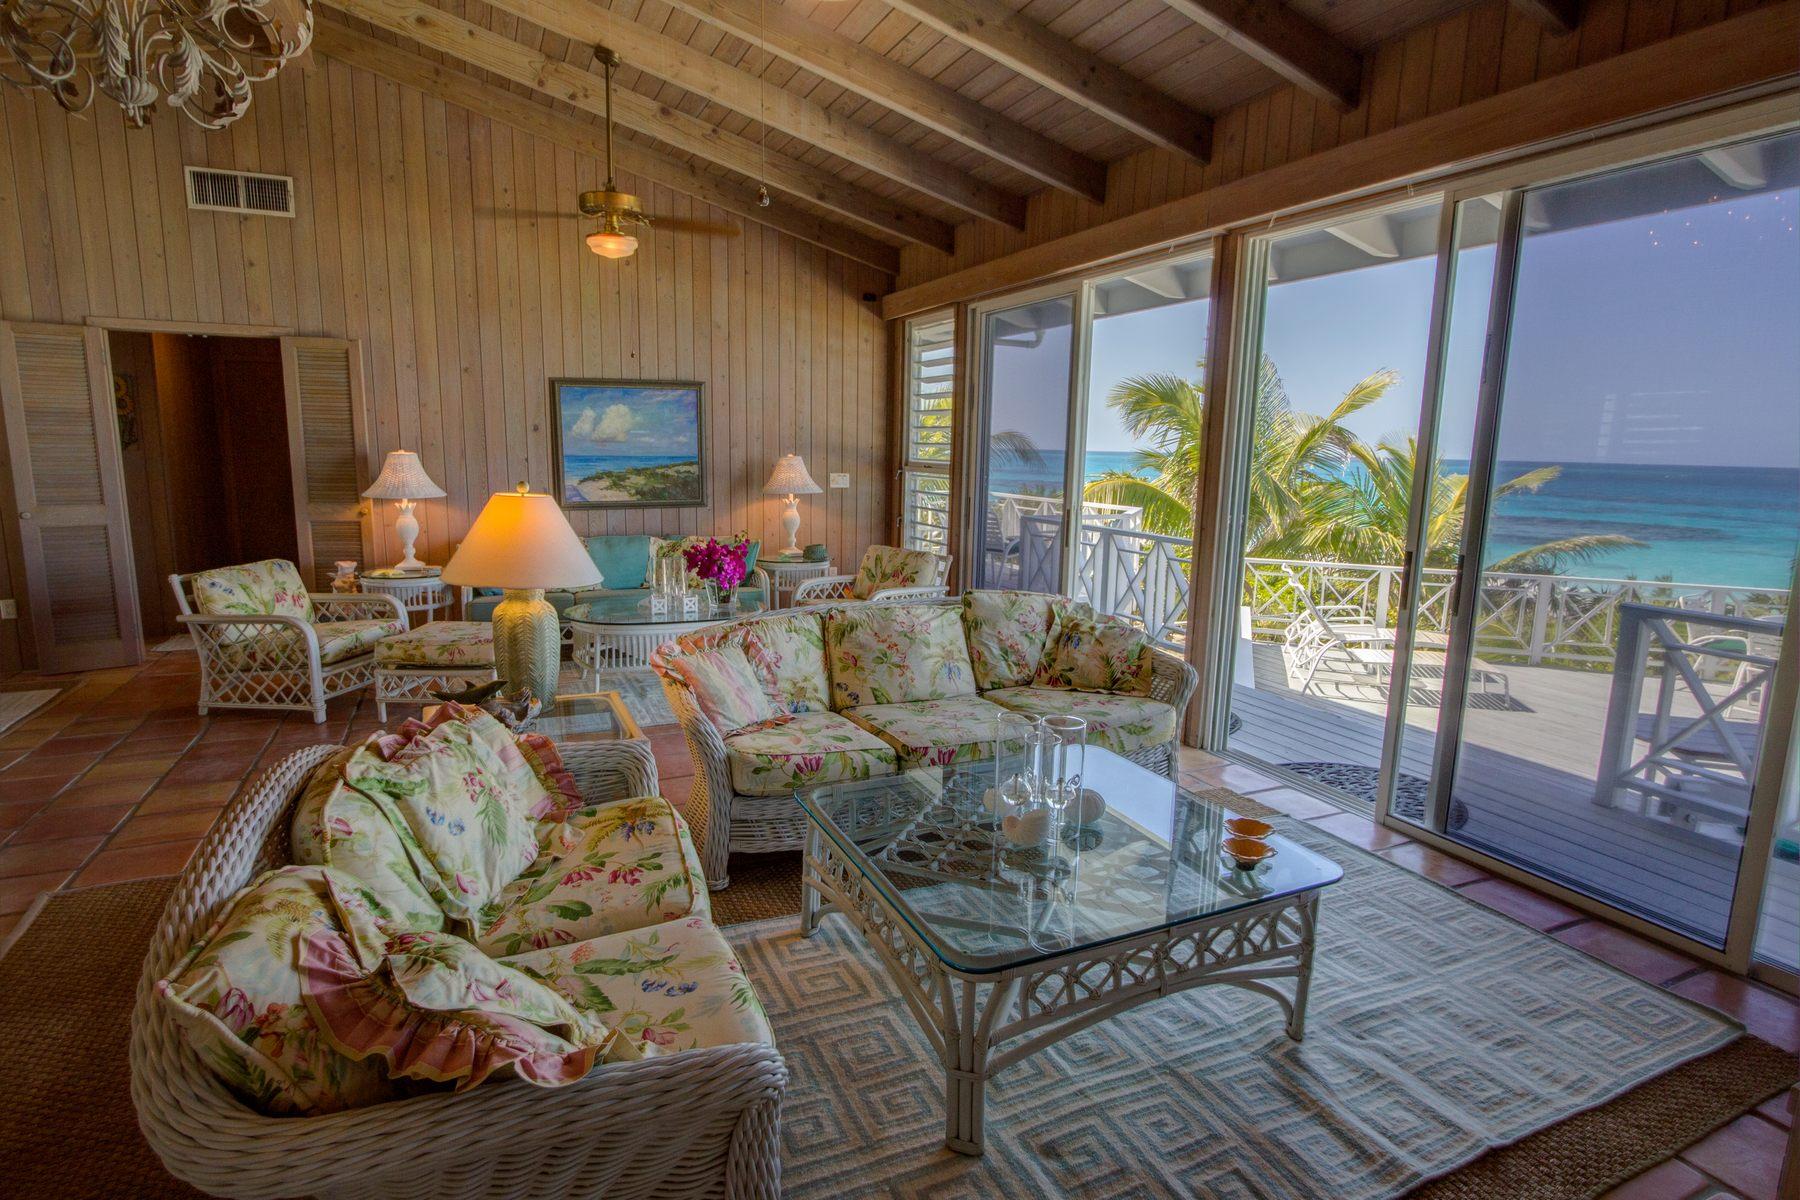 Additional photo for property listing at C-Lark Scotland Cay, Abaco Bahamas